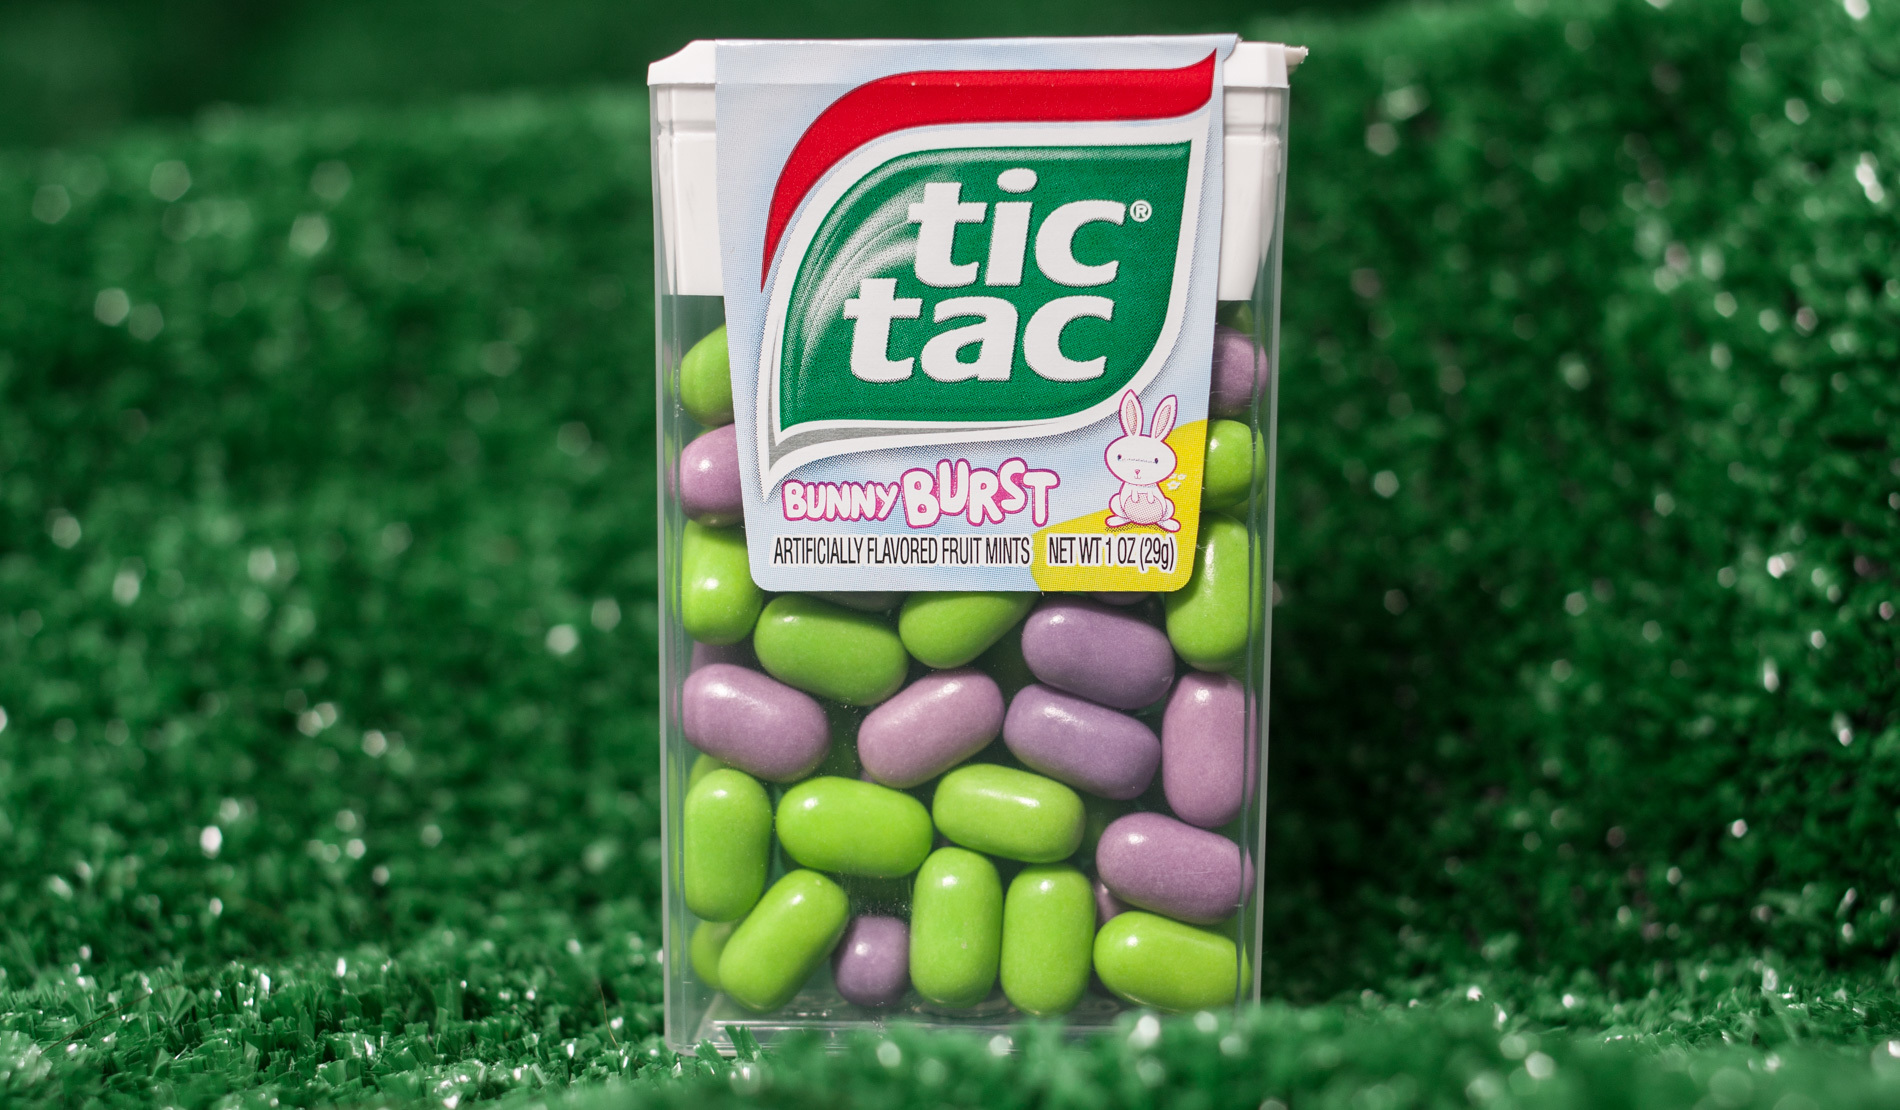 Tic Tac Bunny Burst, $1